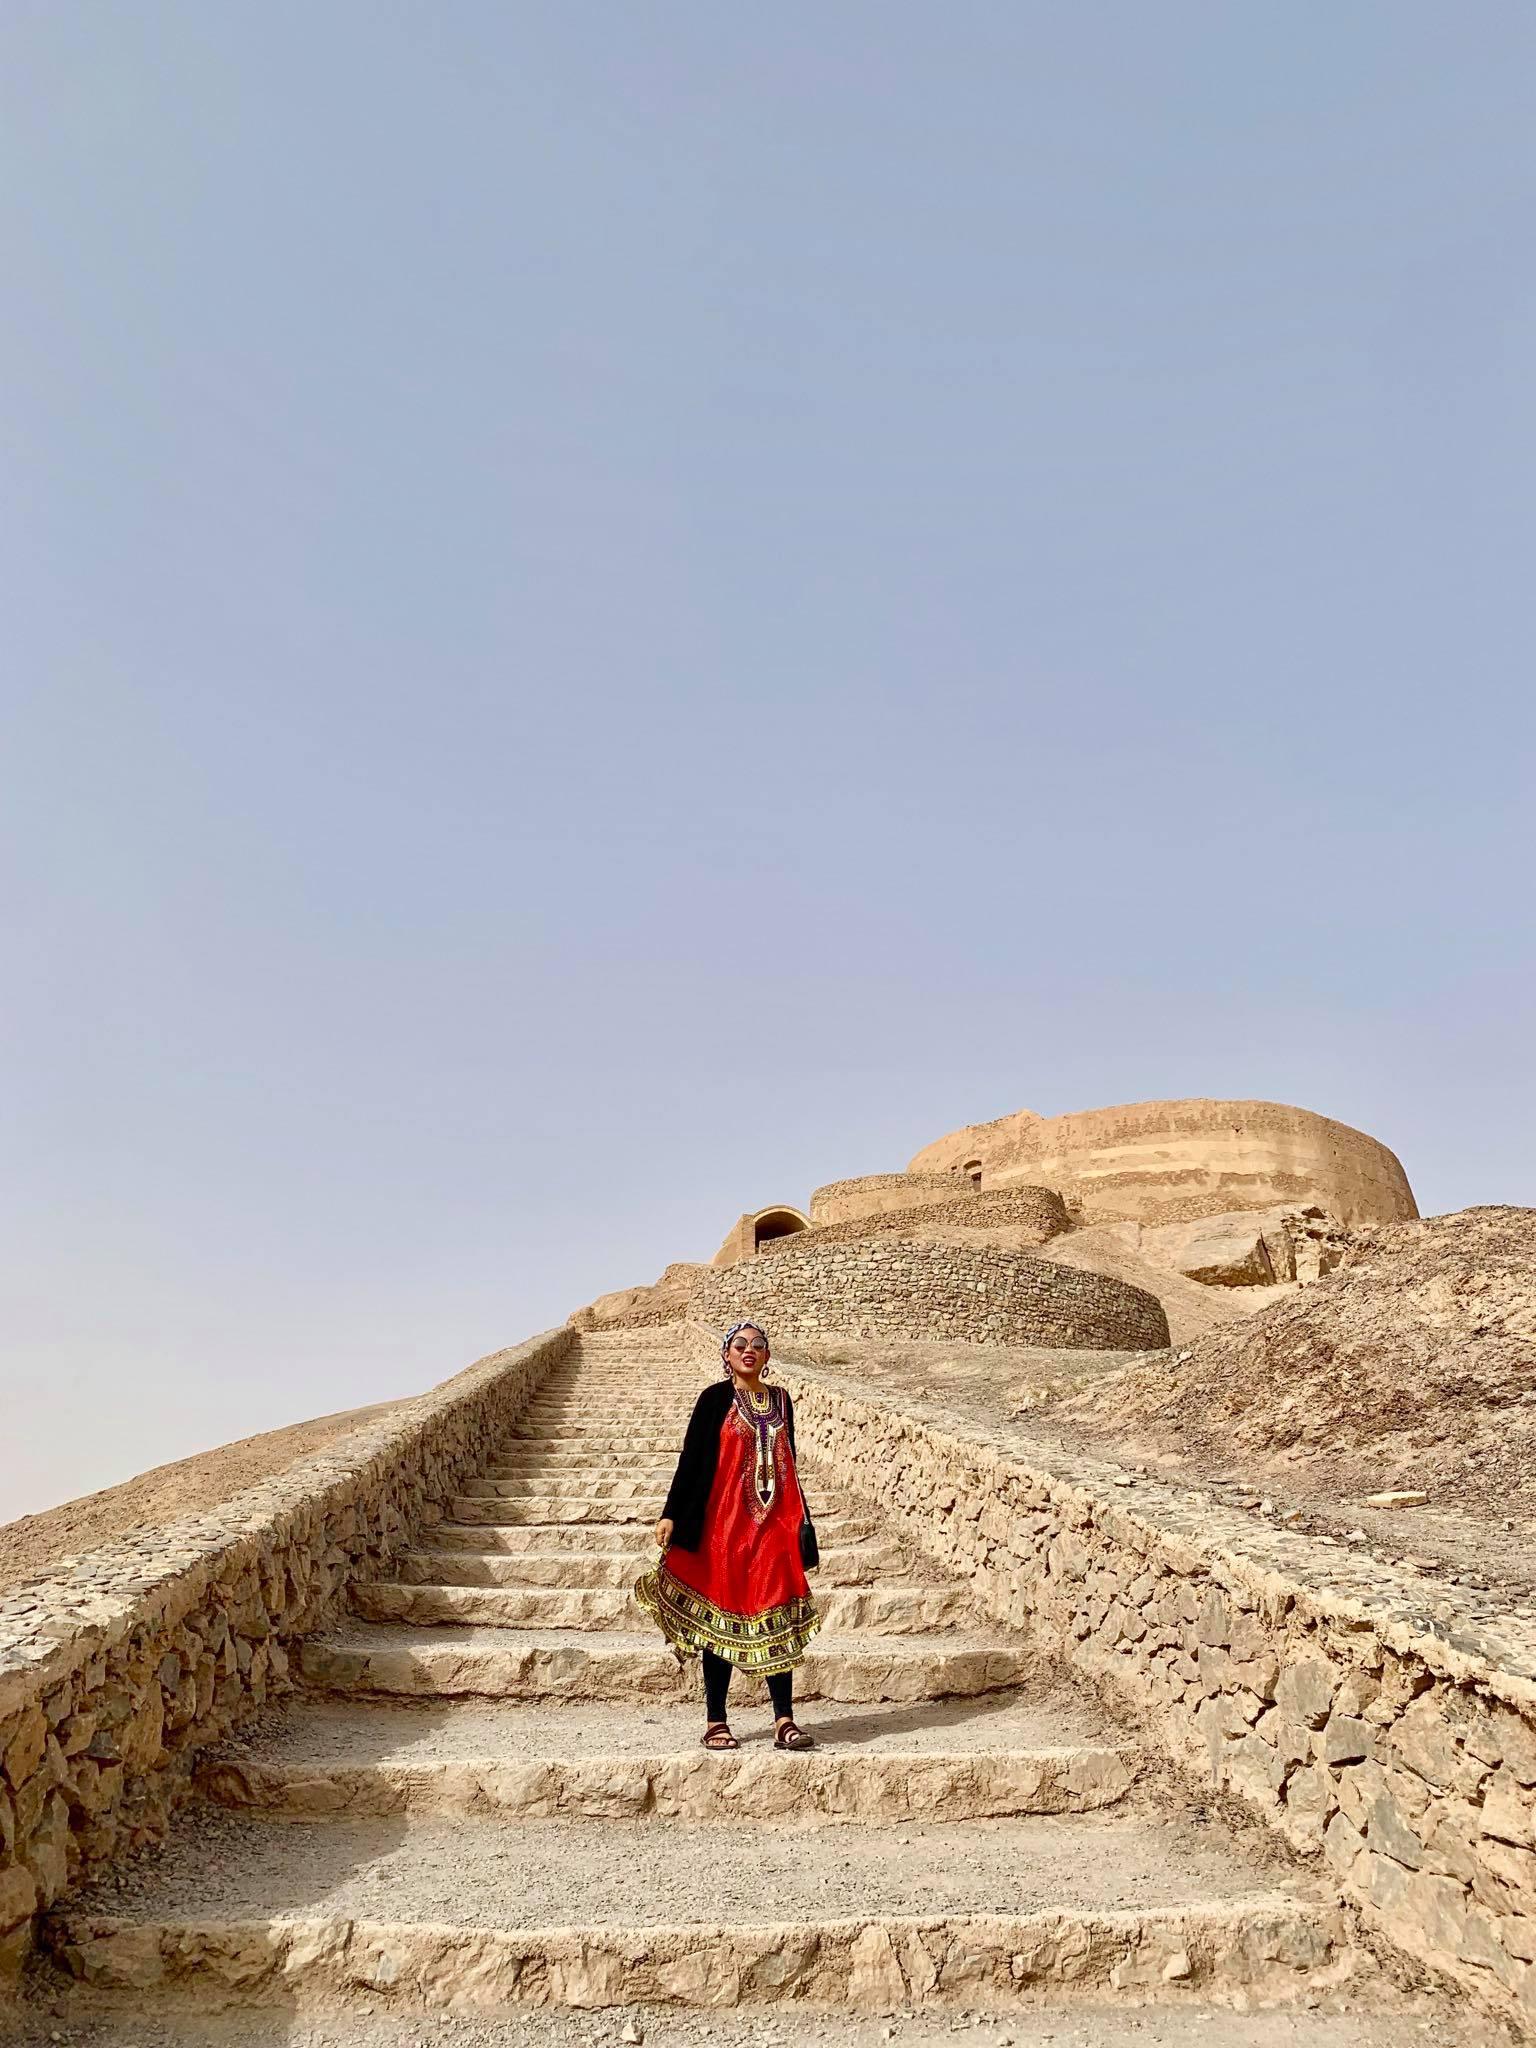 Kach Solo Travels in 2019 YAZD - the desert city in Iran11.jpg